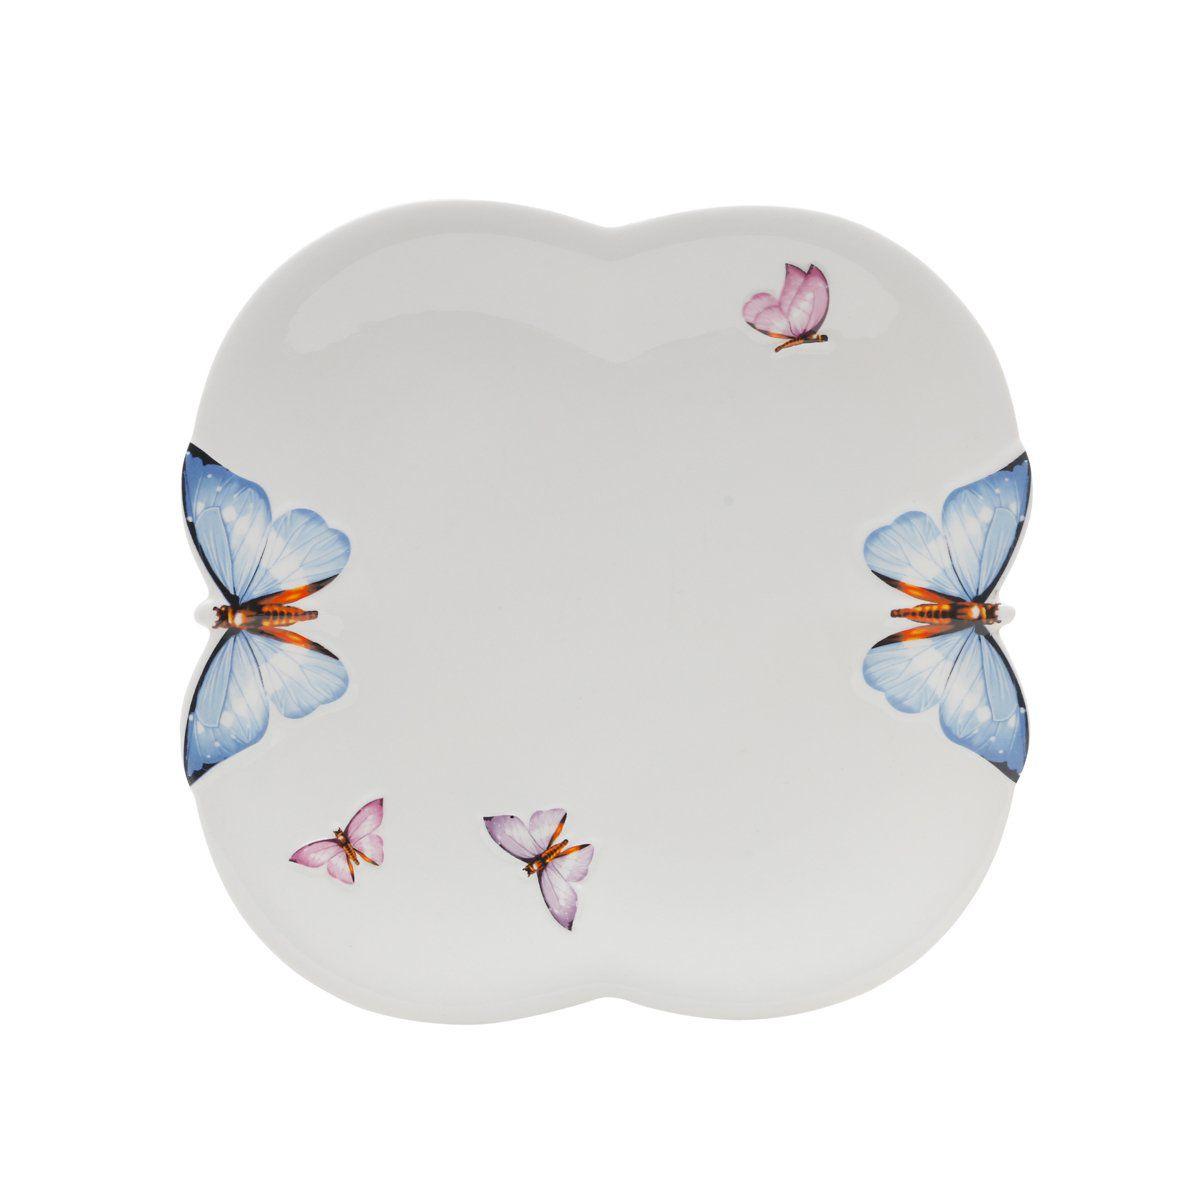 Jogo 6 pratos 26,5 cm de porcelana branca Borboletas Wolff - 1169